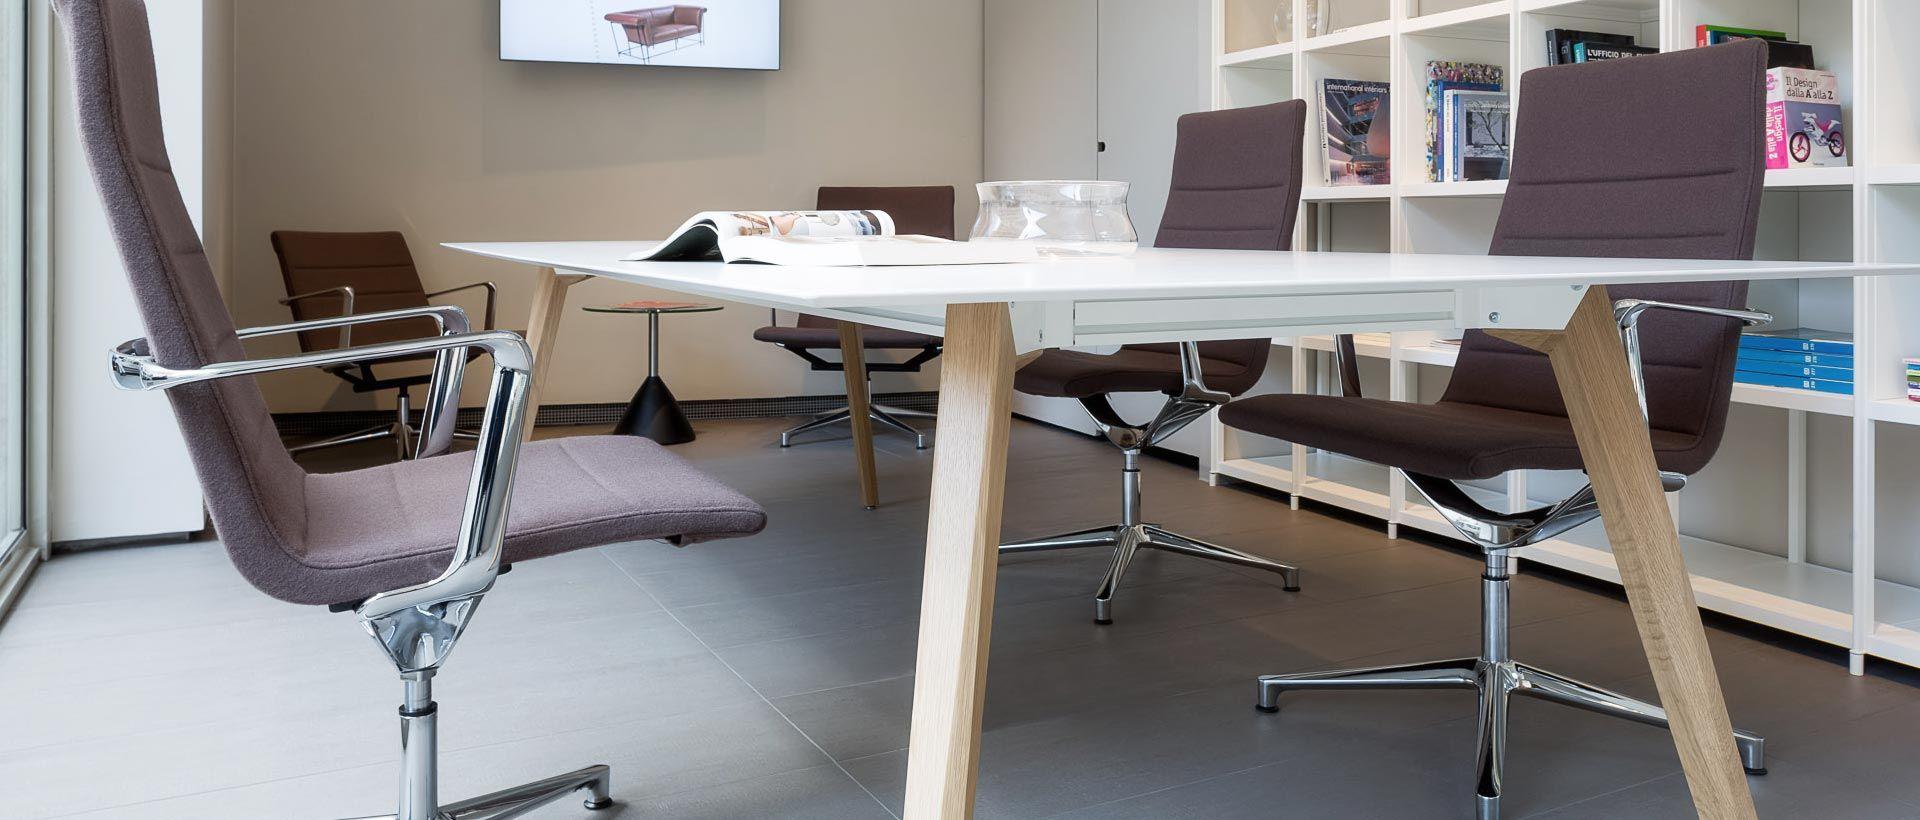 Sedie ufficio a roma la scelta pi vasta d 39 italia for Sedie ufficio design